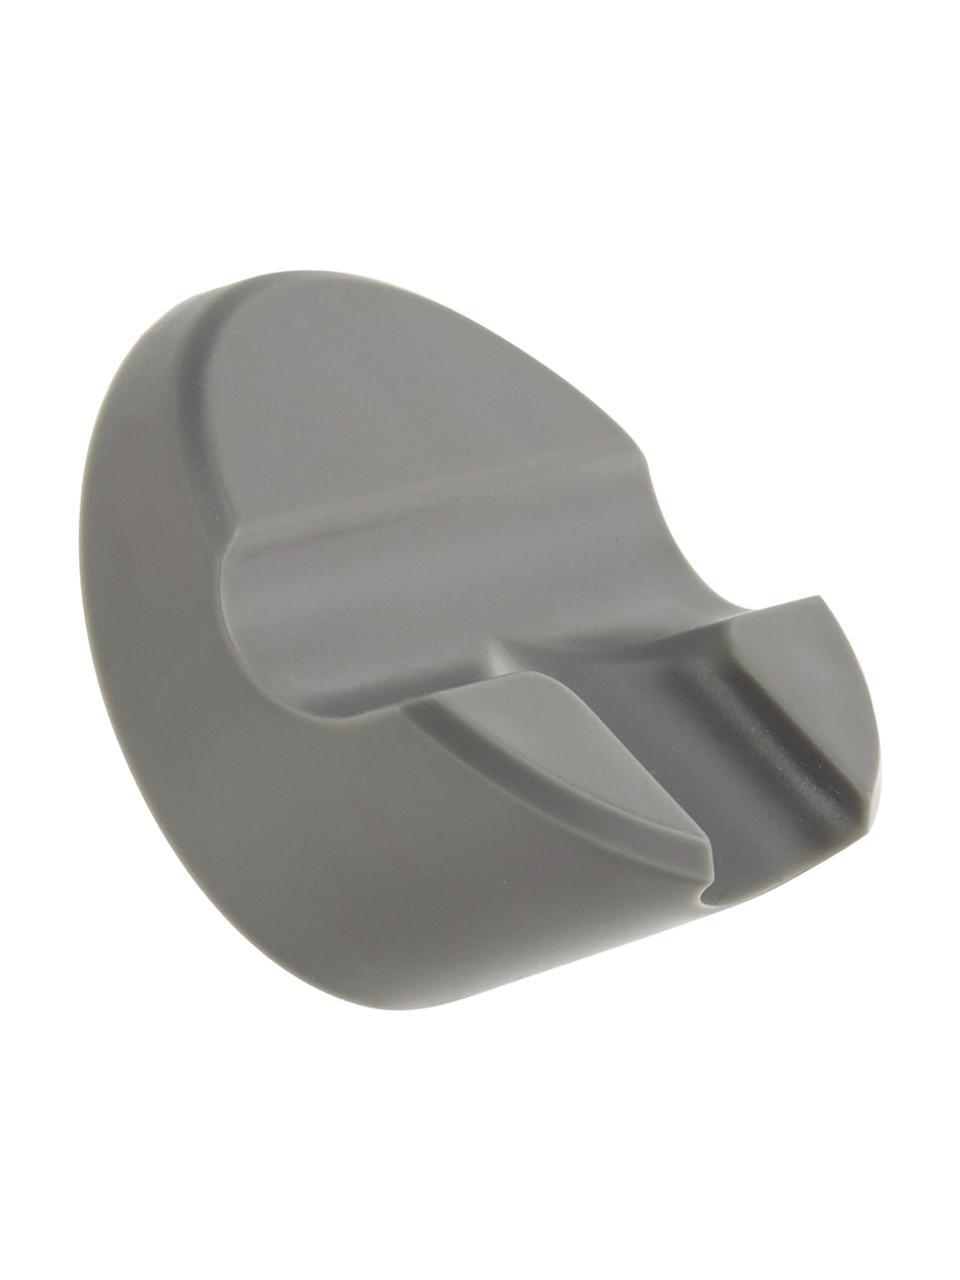 Abzieher Nova mit Wandaufhängung, Grau, 21 x 5 cm